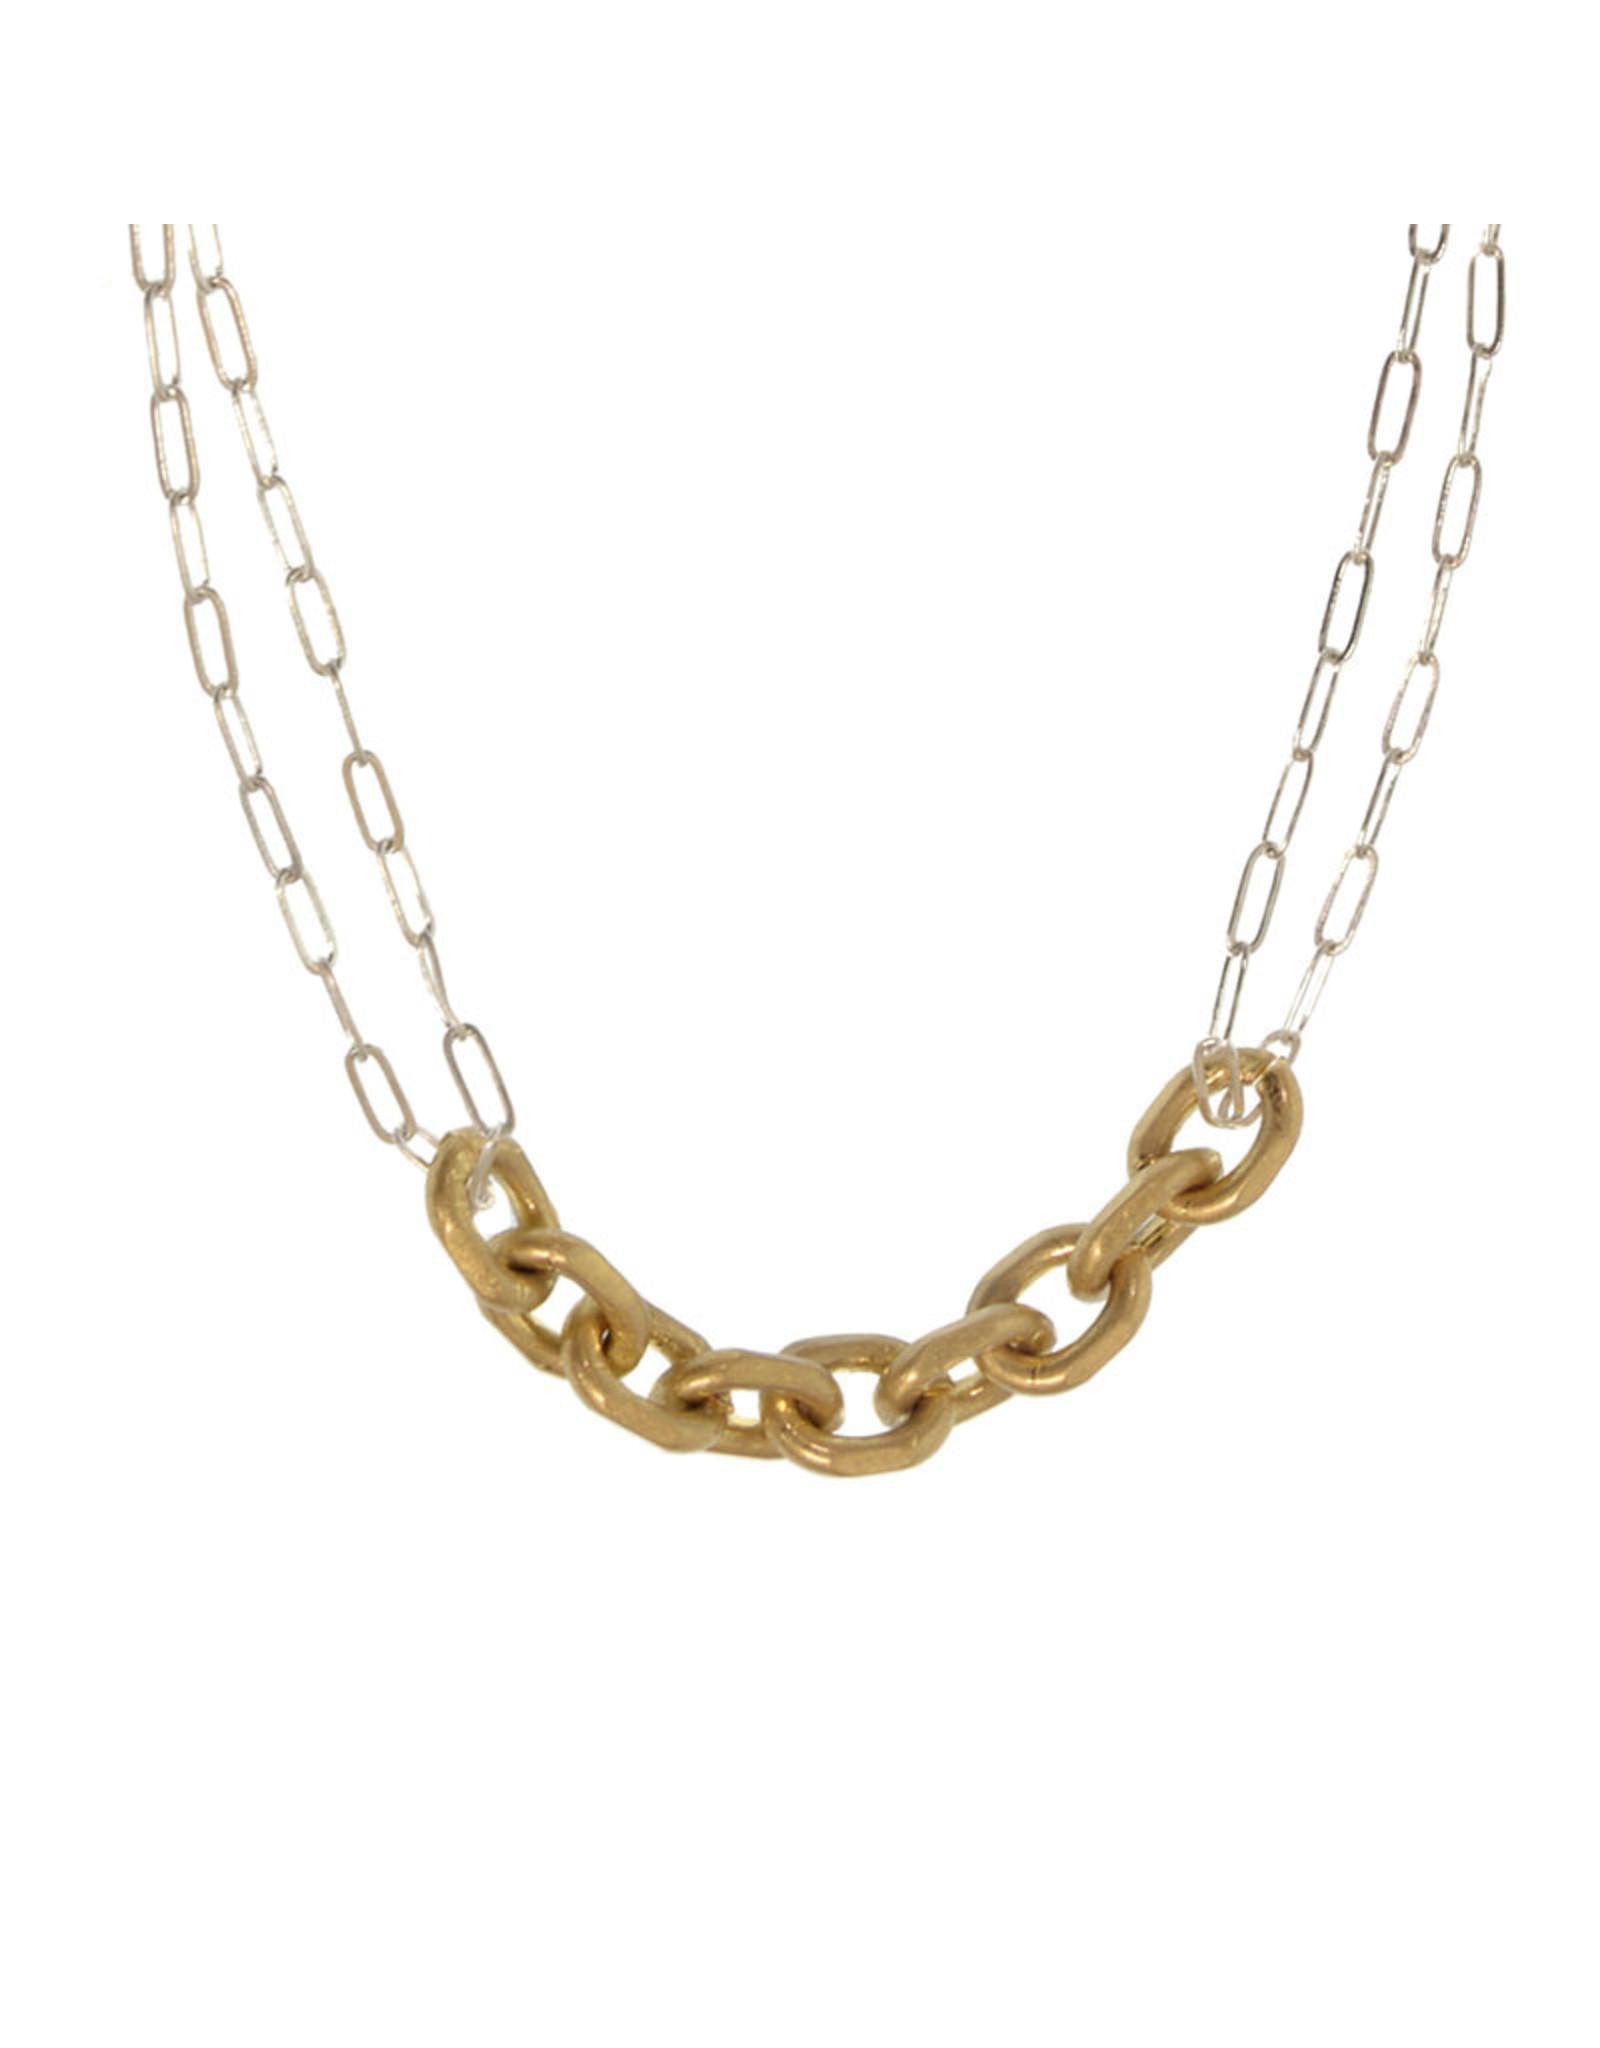 Joy Susan Gold & Silver Chain Link Necklace